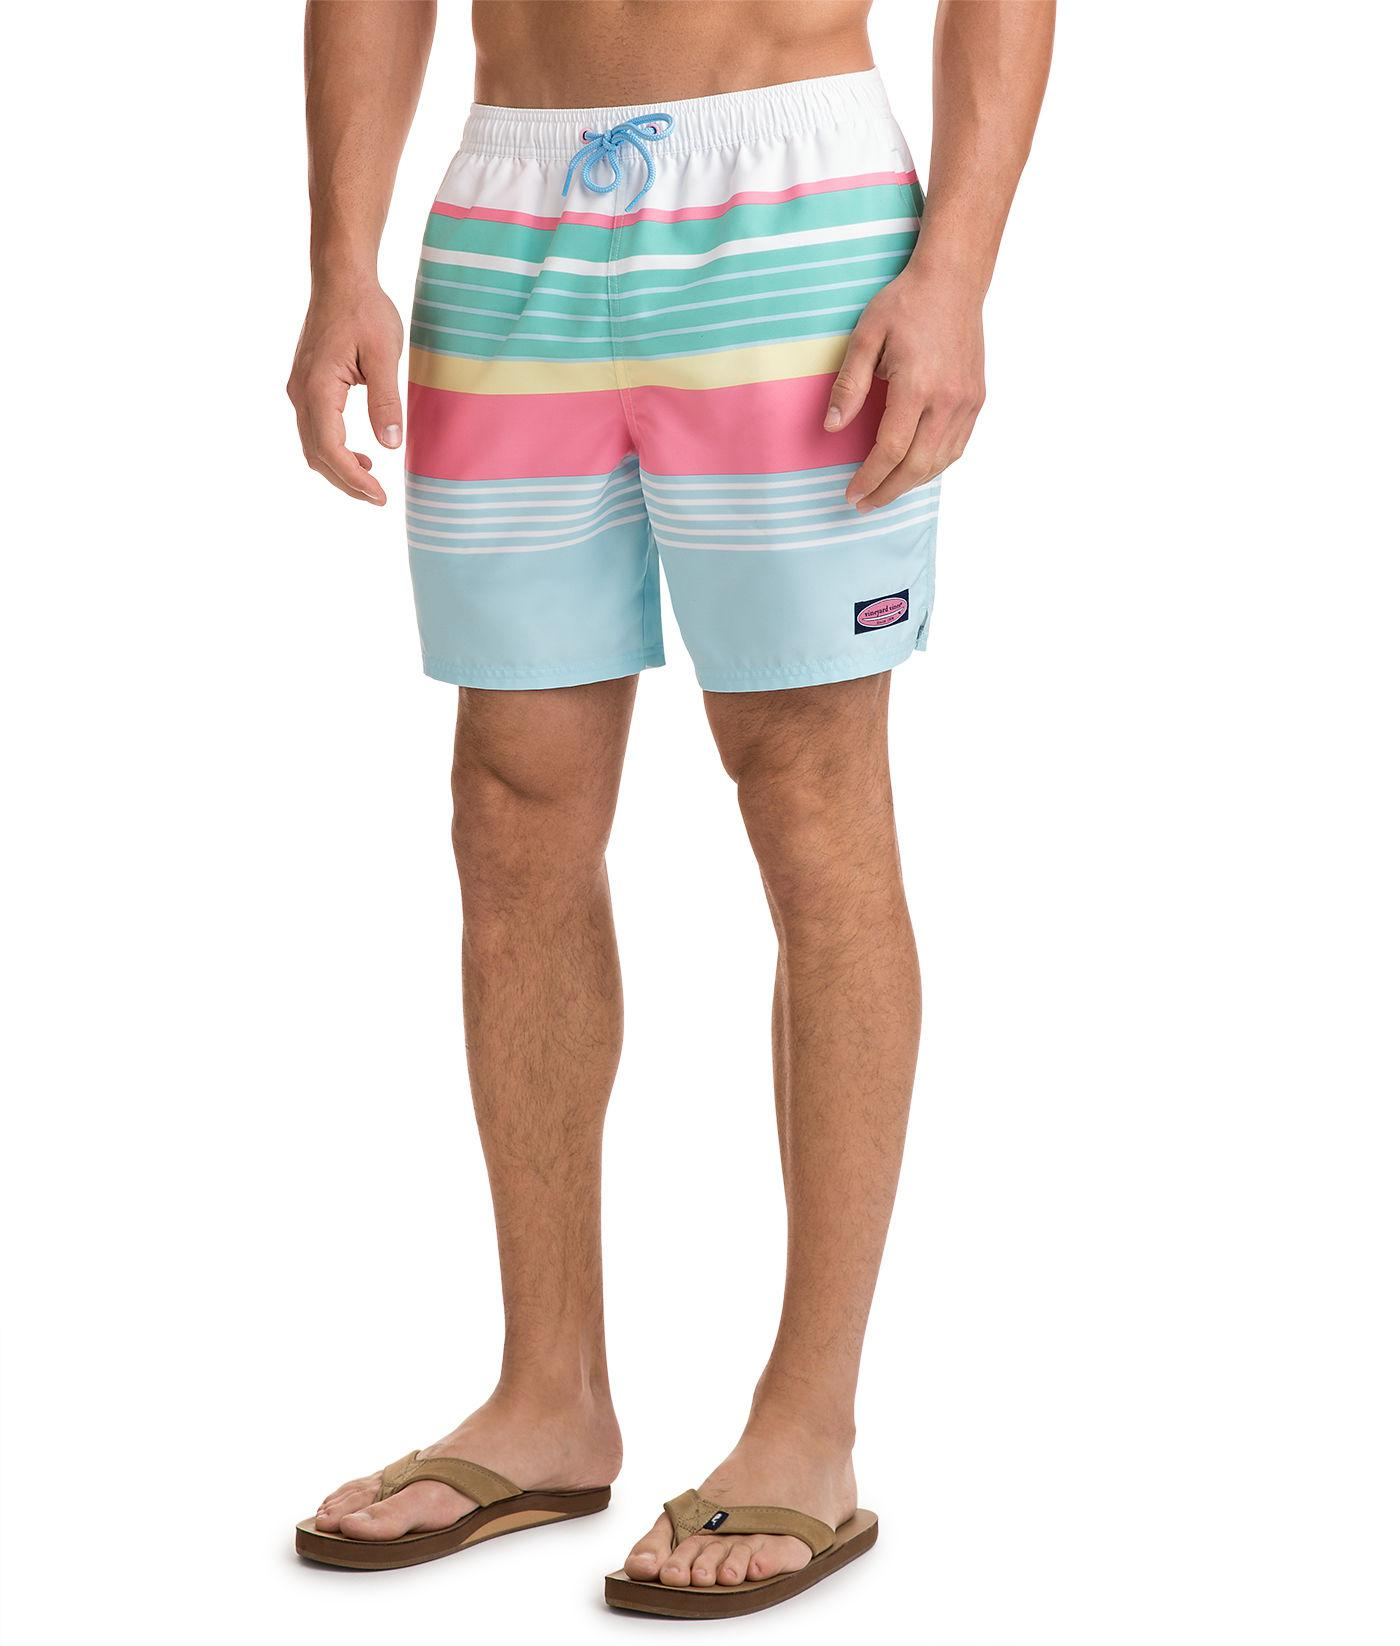 94c45db9c8358 Lyst - Vineyard Vines Boca Bay Stripe Chappy Trunks in Blue for Men